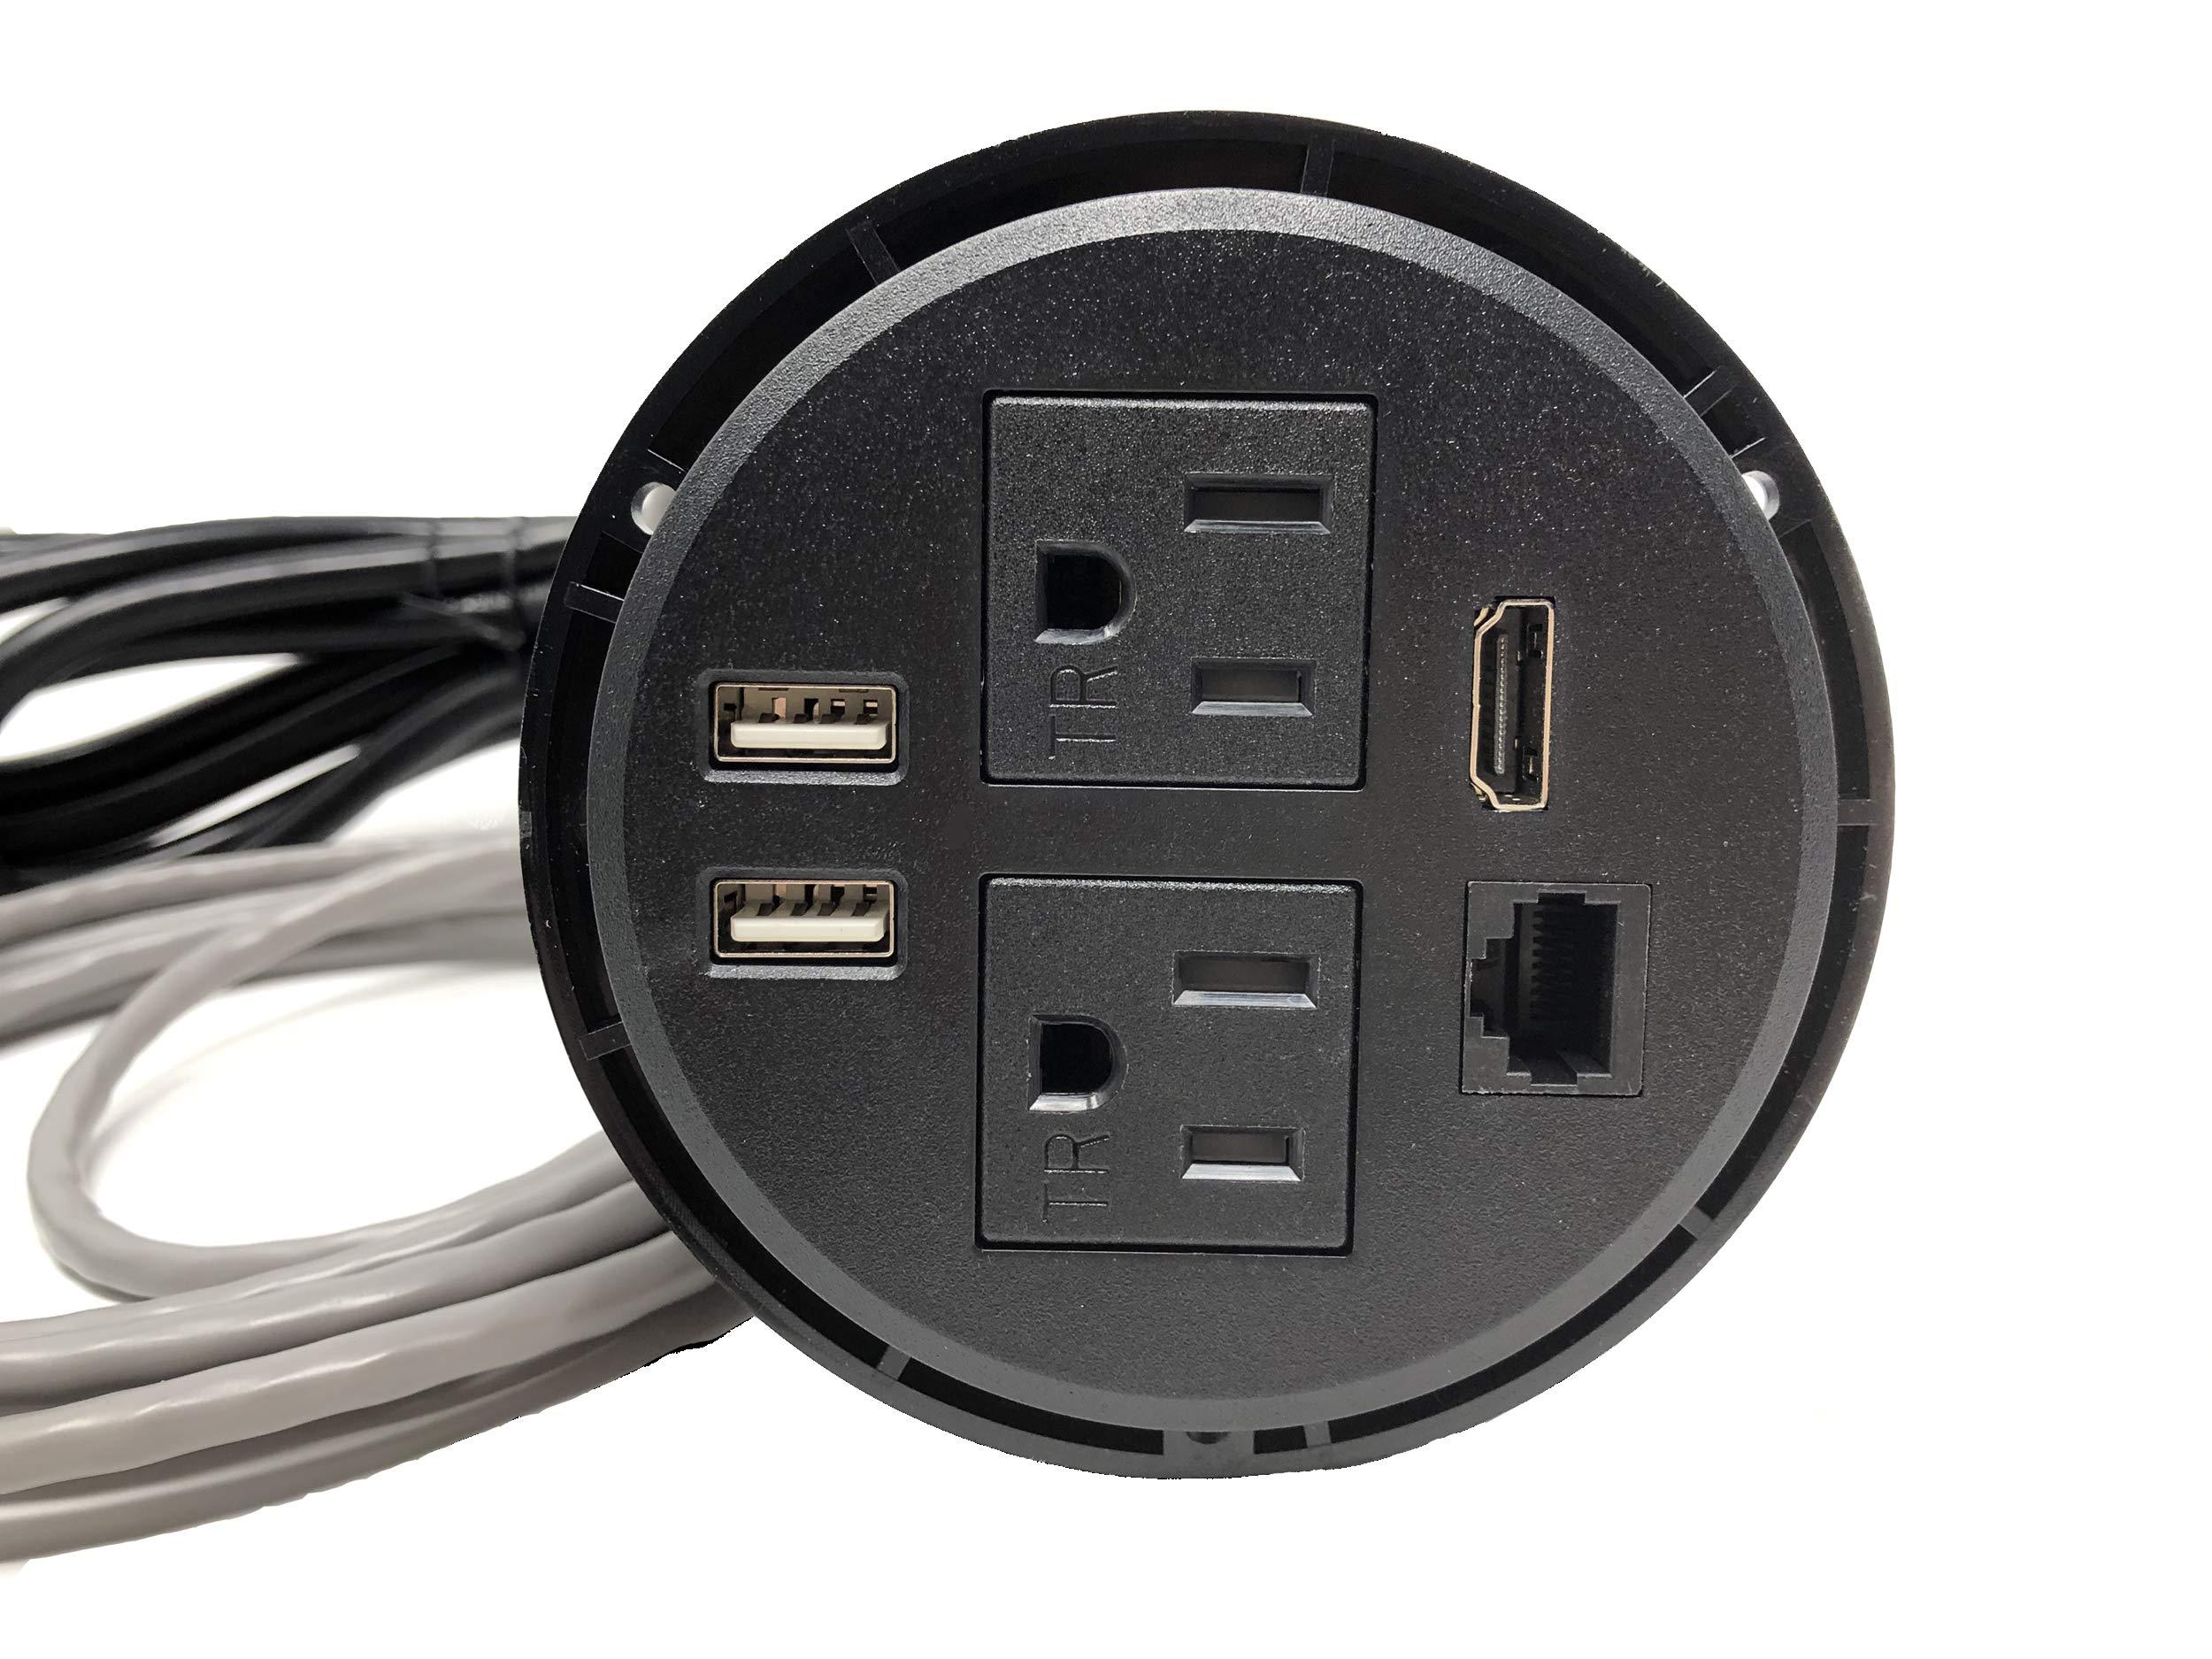 Round Desktop Conference Room Power Grommet Outlet, FITS 3 1/8'' - 3 1/4'' 2 (TR) AC Outlets, 2 USB Charging Ports, 1 CAT 6, 1 HDMI, ETL Listed (DC-8689-Black)